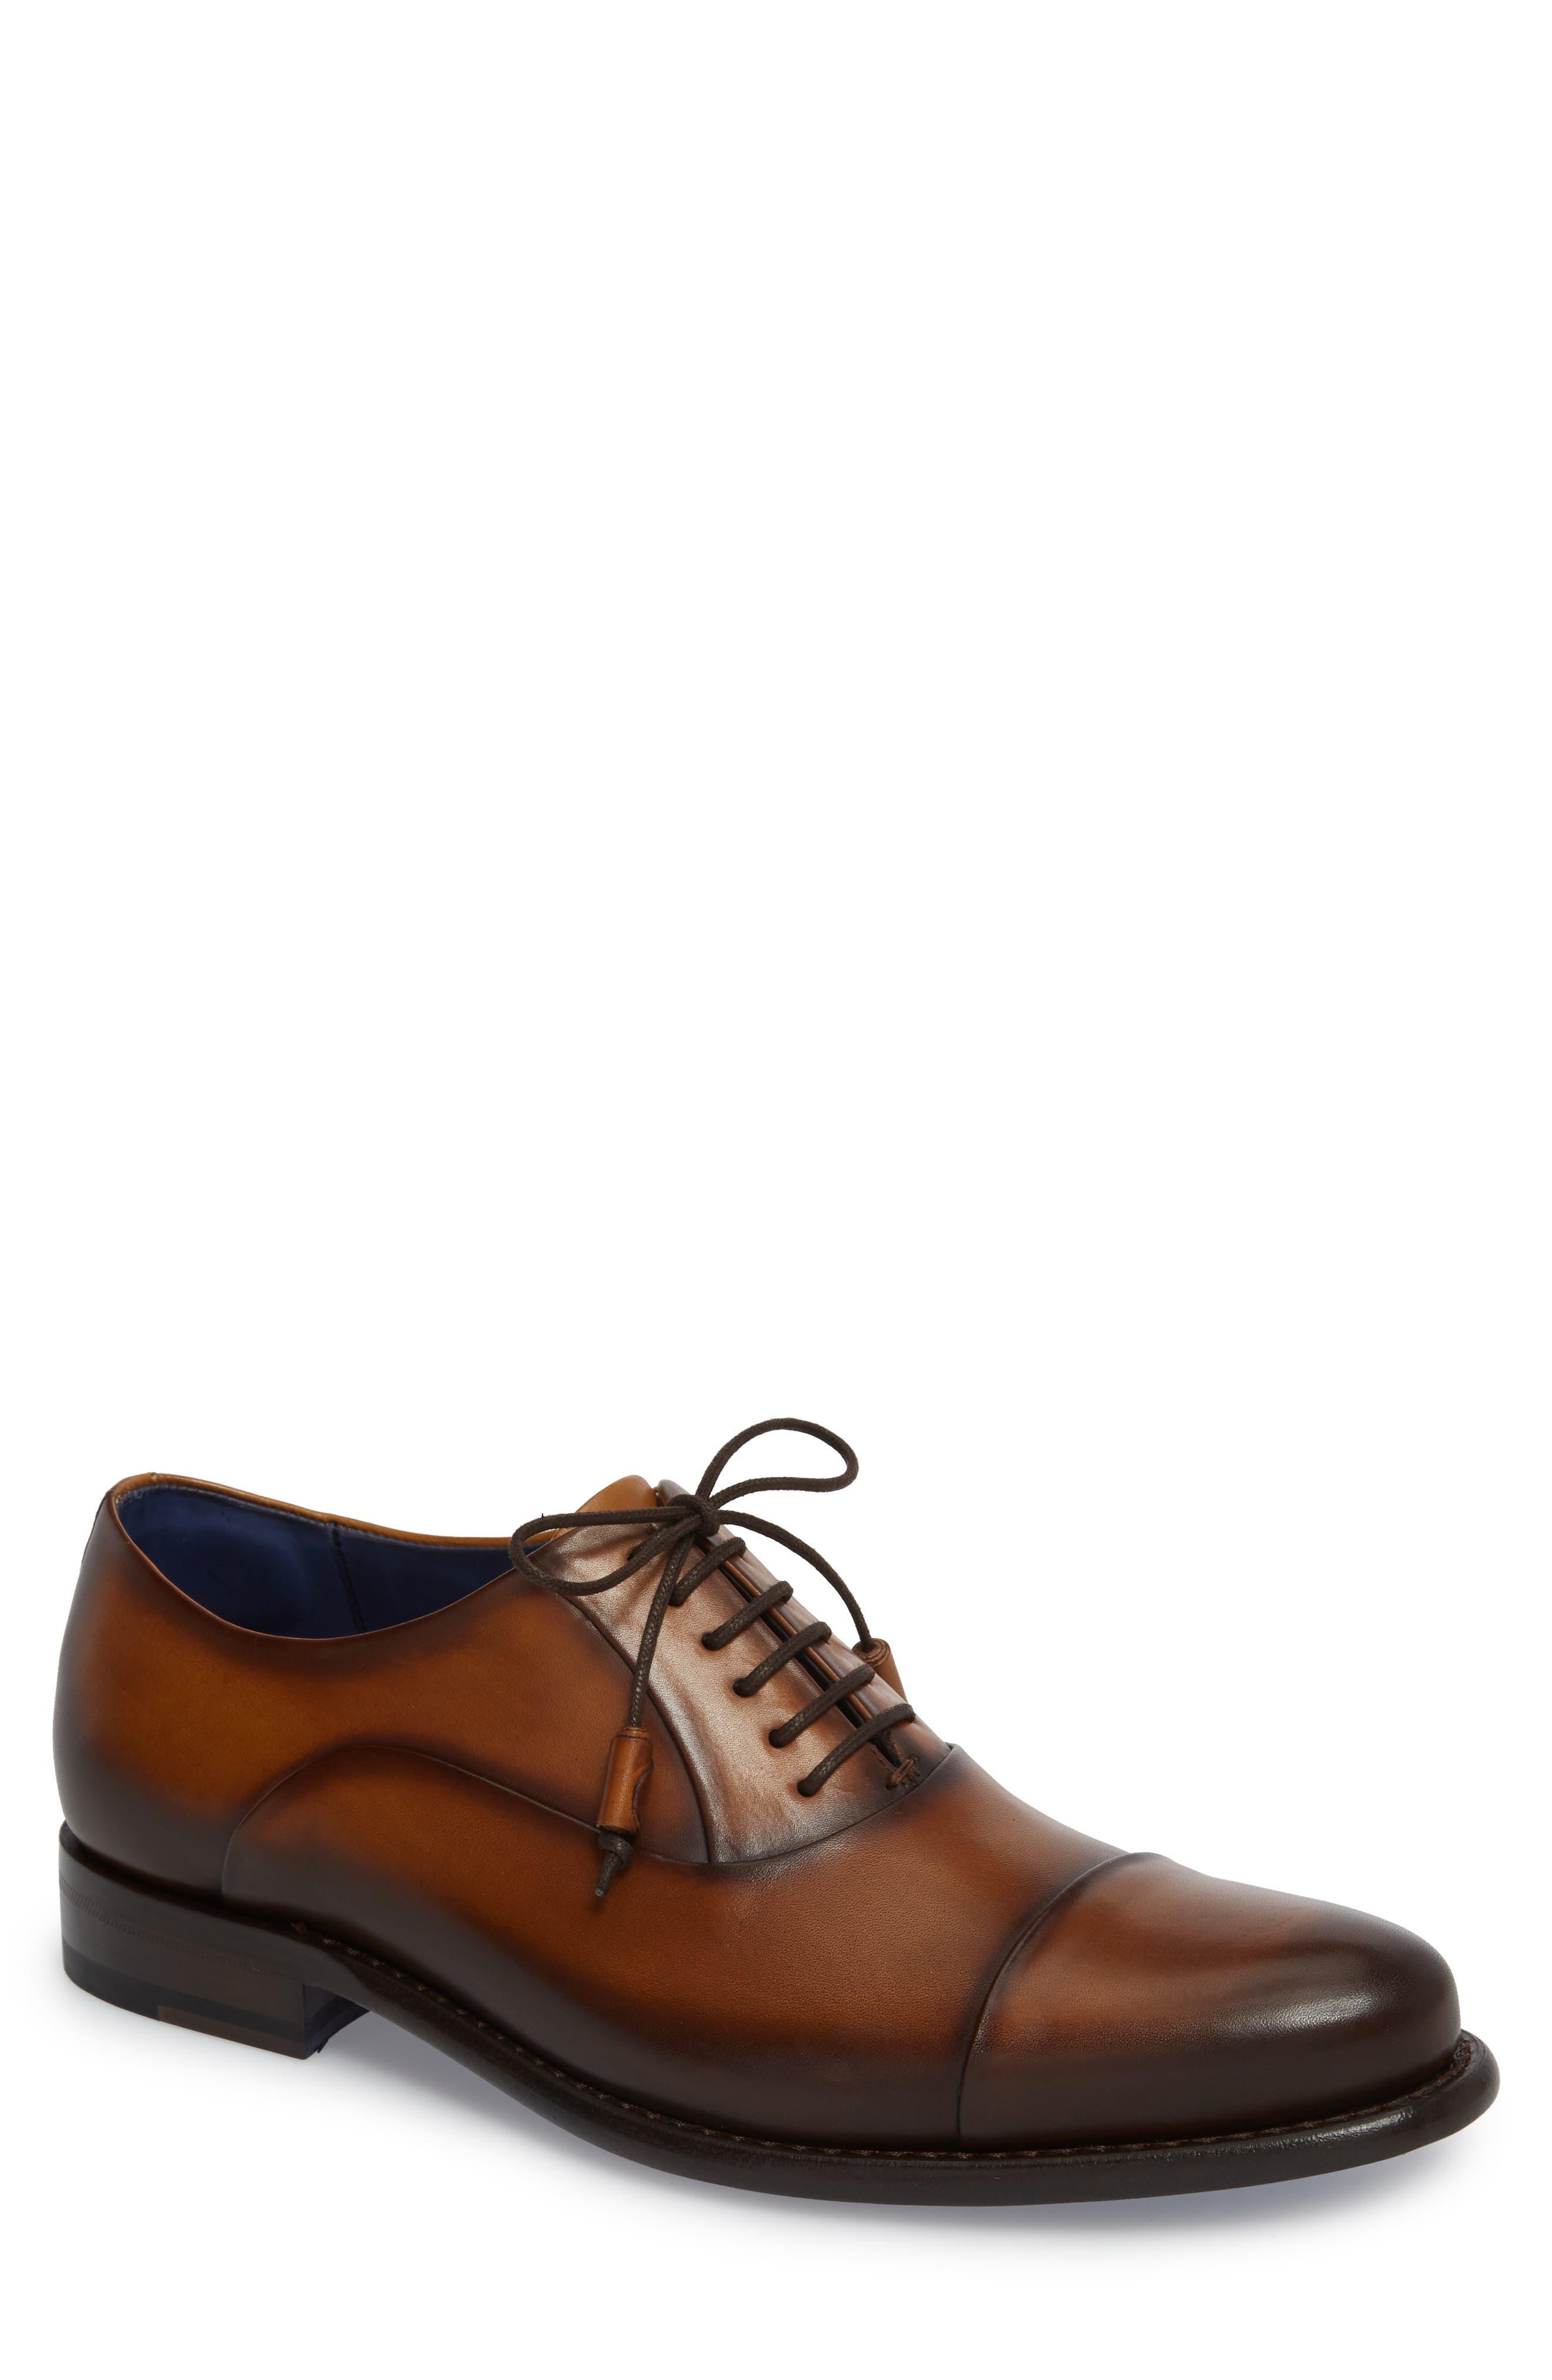 Helios Cap Toe Oxford,                             Main thumbnail 1, color,                             Honey Leather